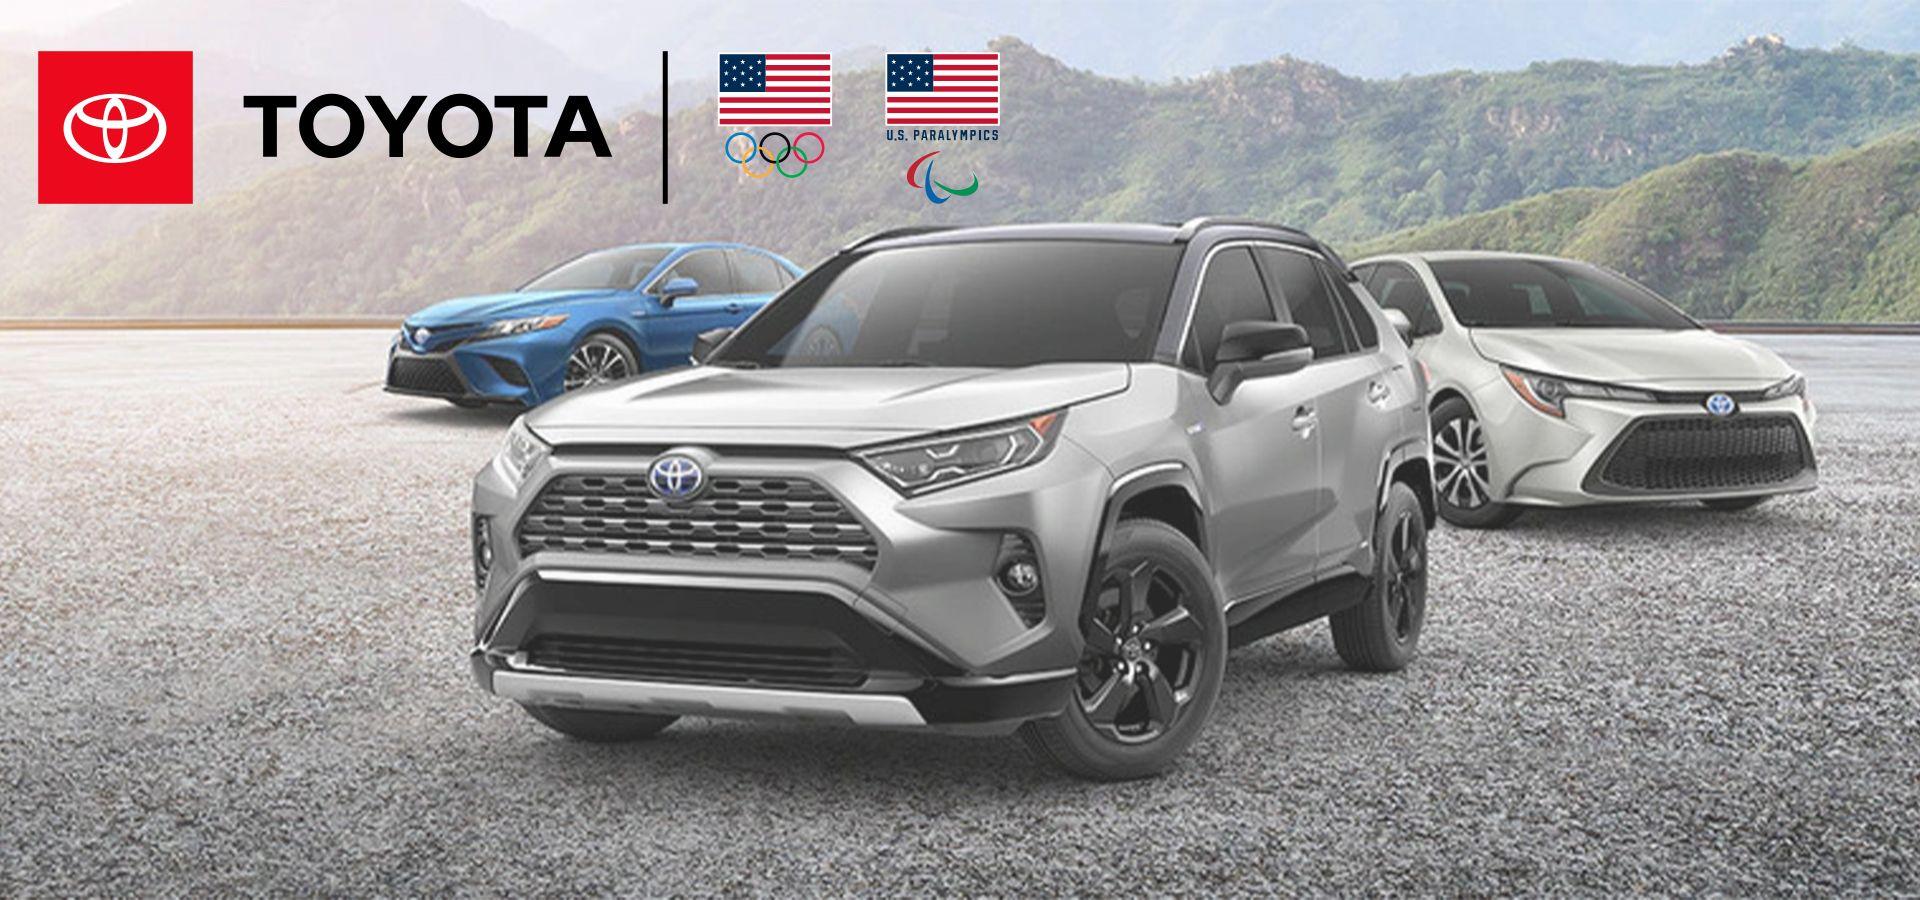 Toyota Olympic Sponsor